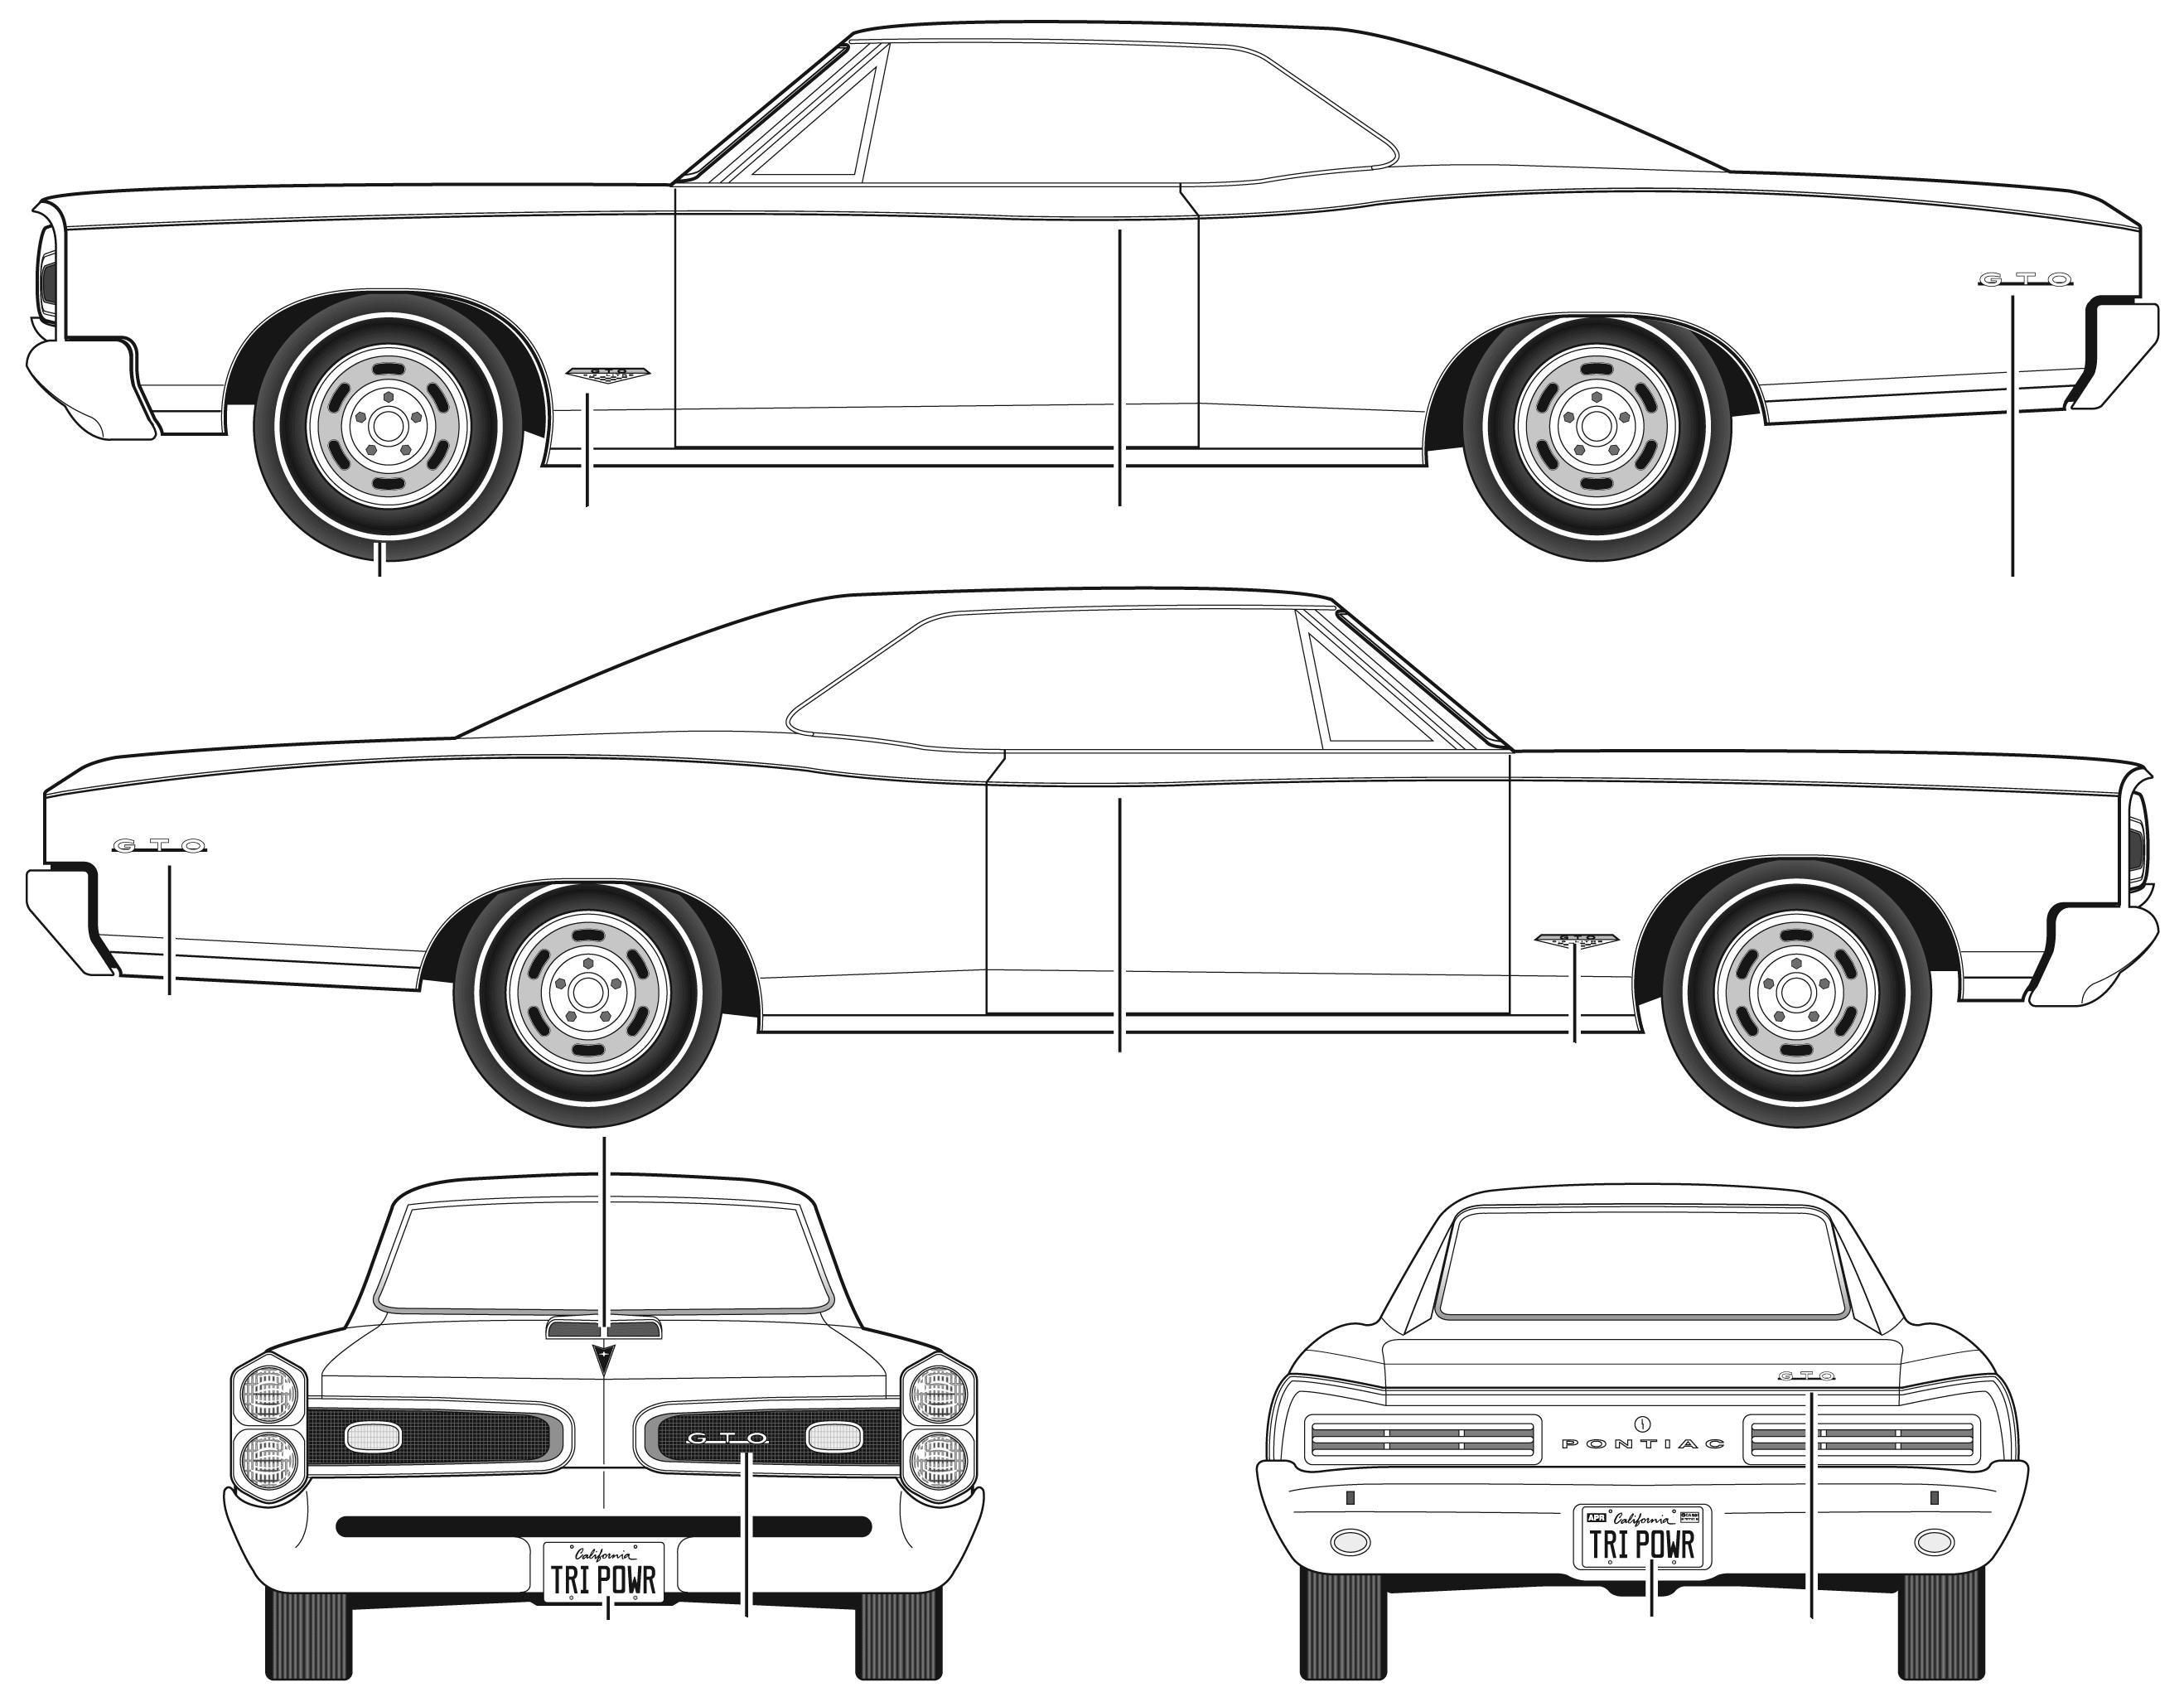 1966 pontiac gto coupe blueprints free